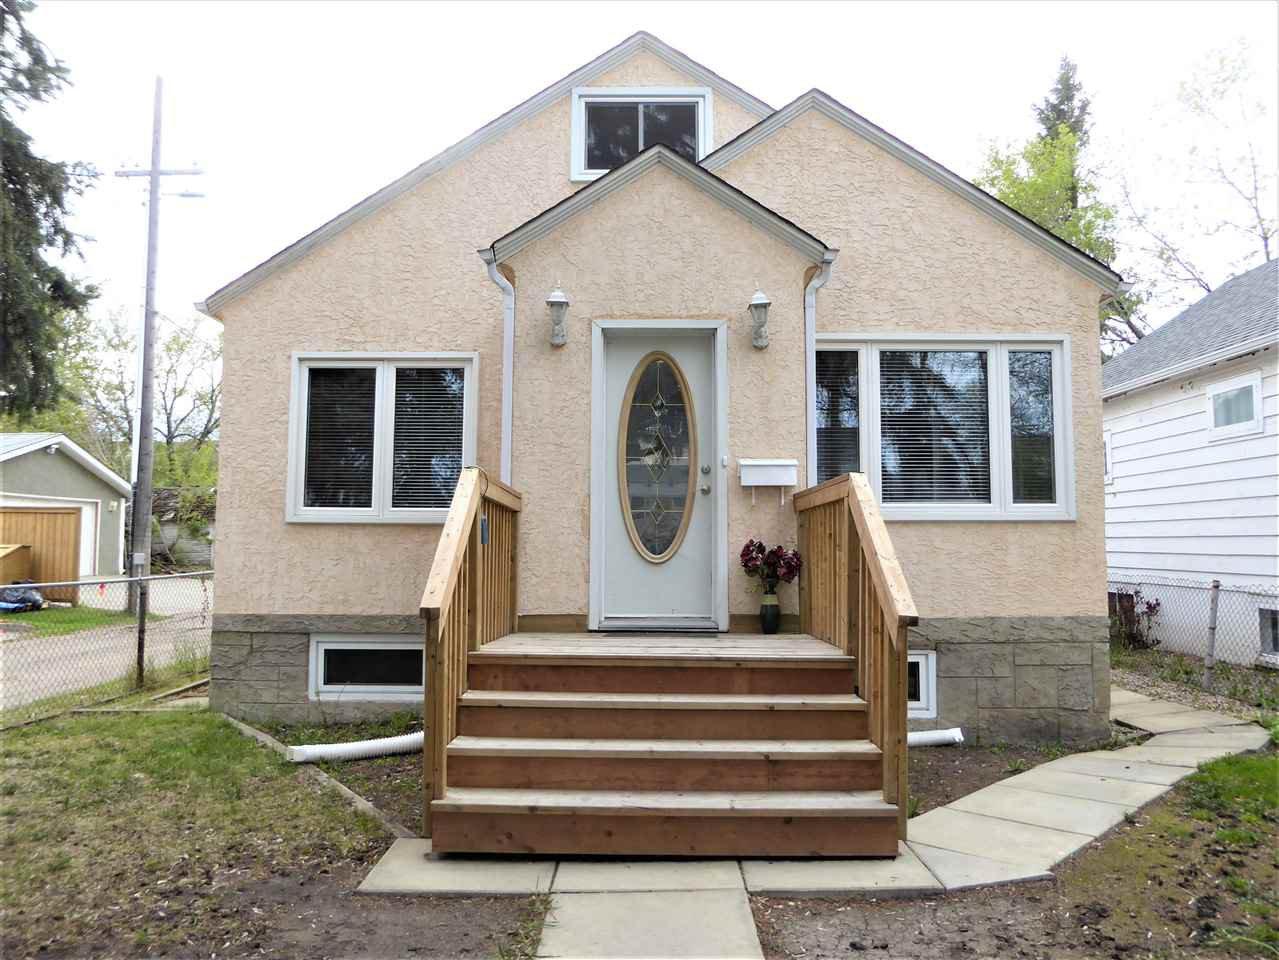 Main Photo: 10216 146 Street E in Edmonton: Zone 21 House for sale : MLS®# E4202390